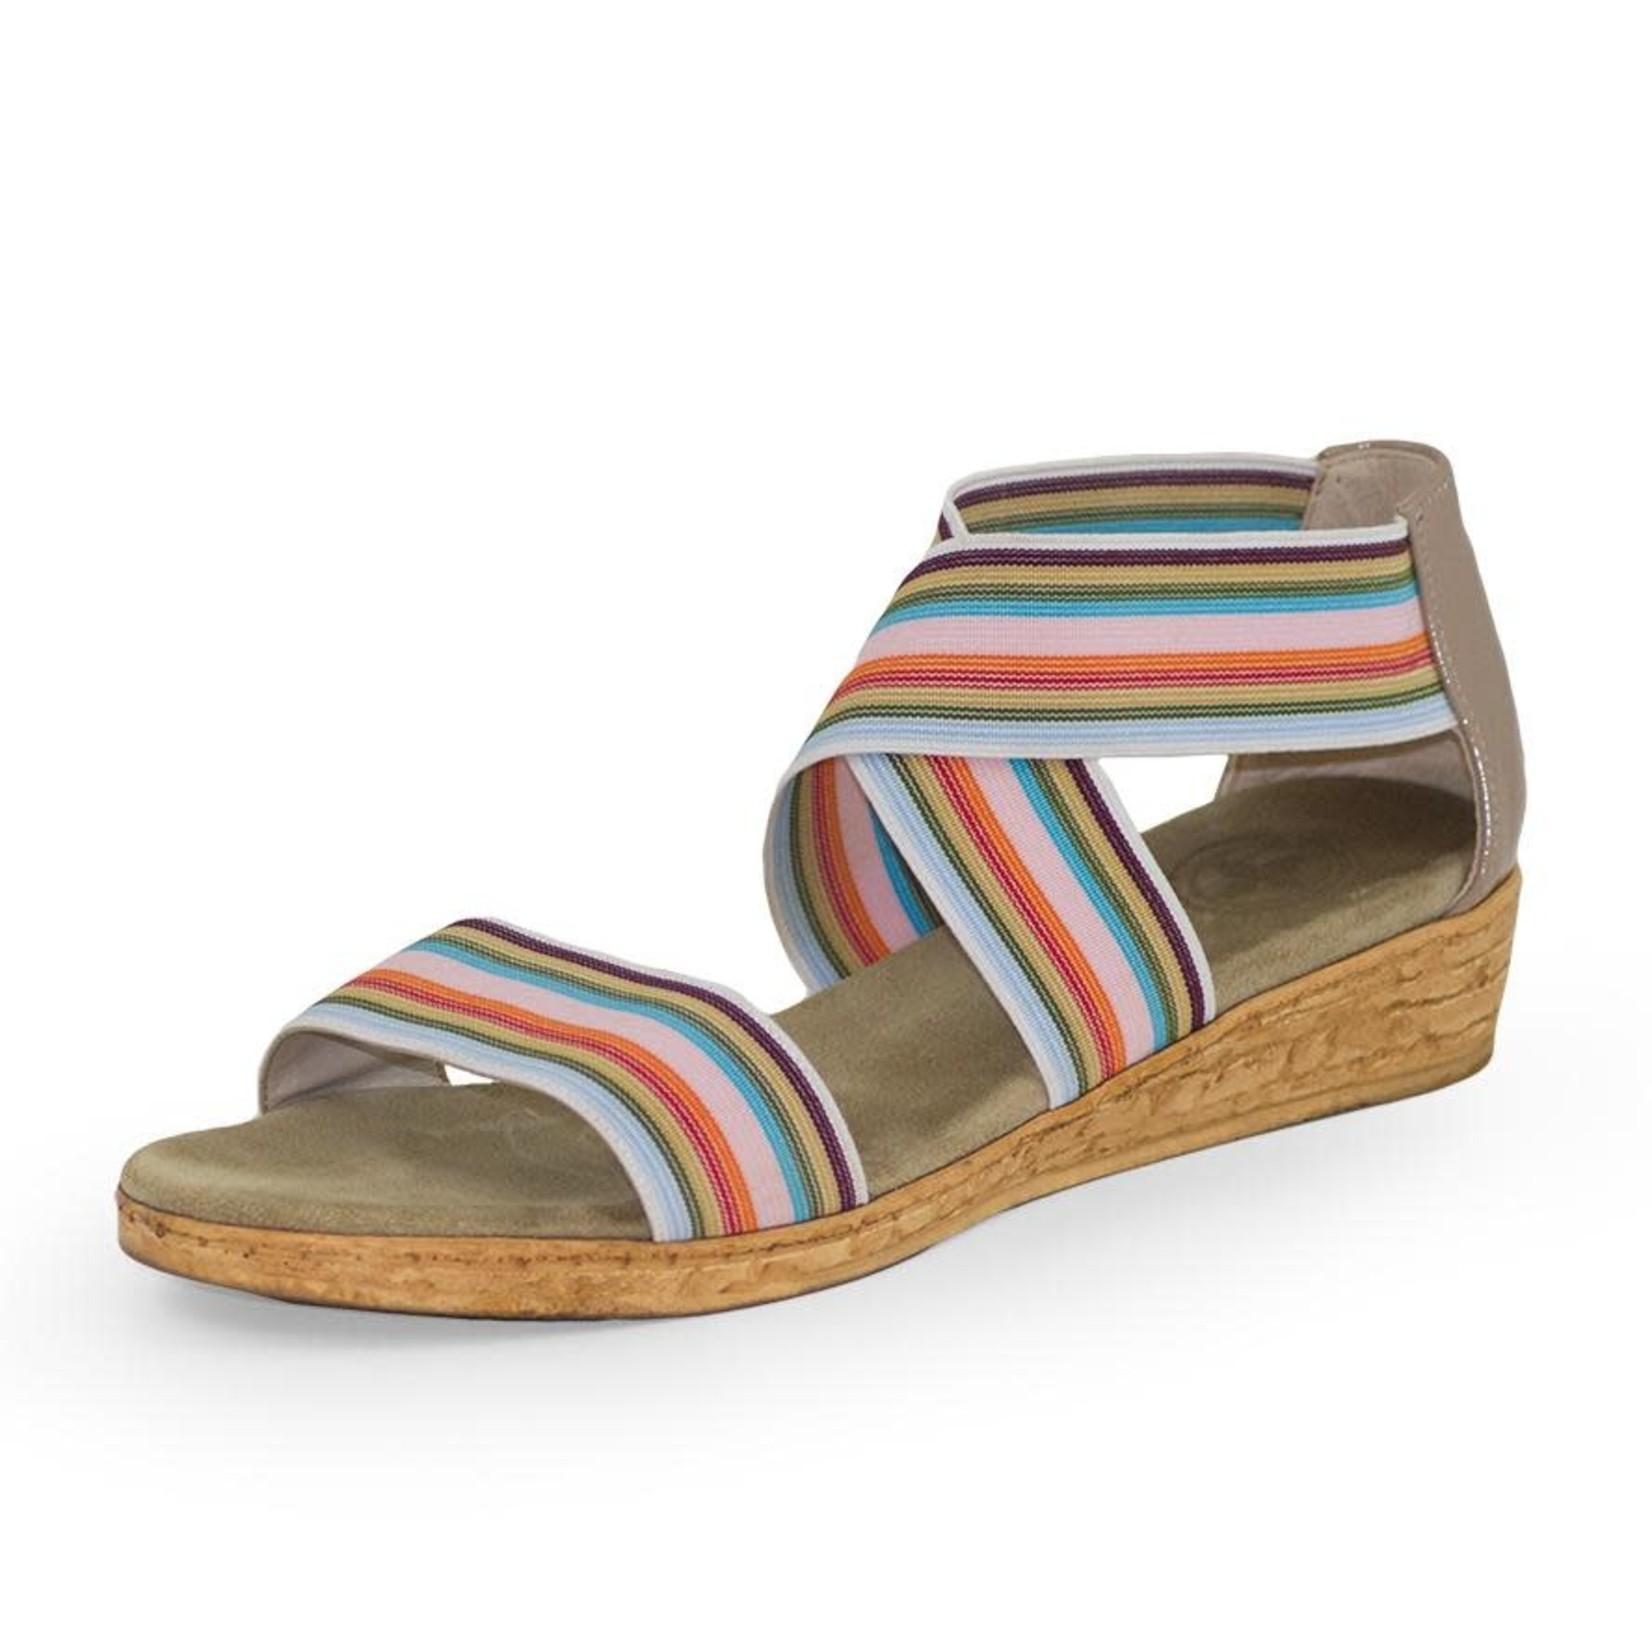 Peri Shoe in Multi Stripe 10